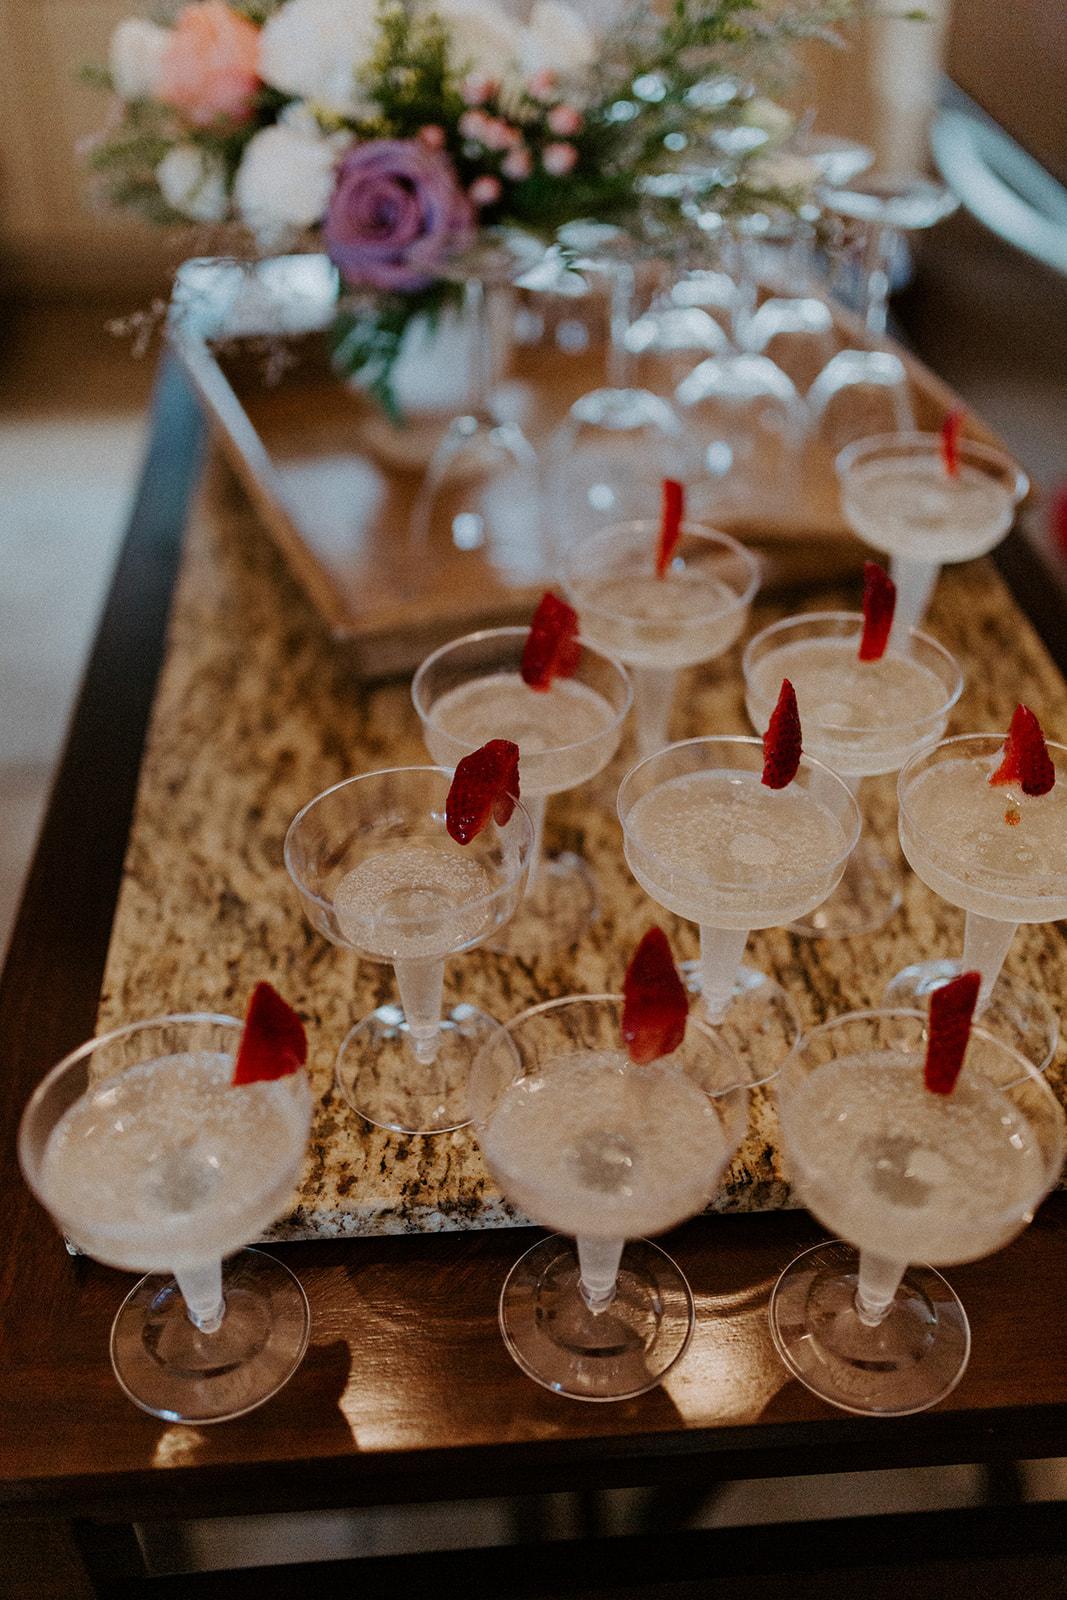 camp_wokanda_peoria_illinois_wedding_photographer_wright_photographs_bliese_0001_websize.jpg